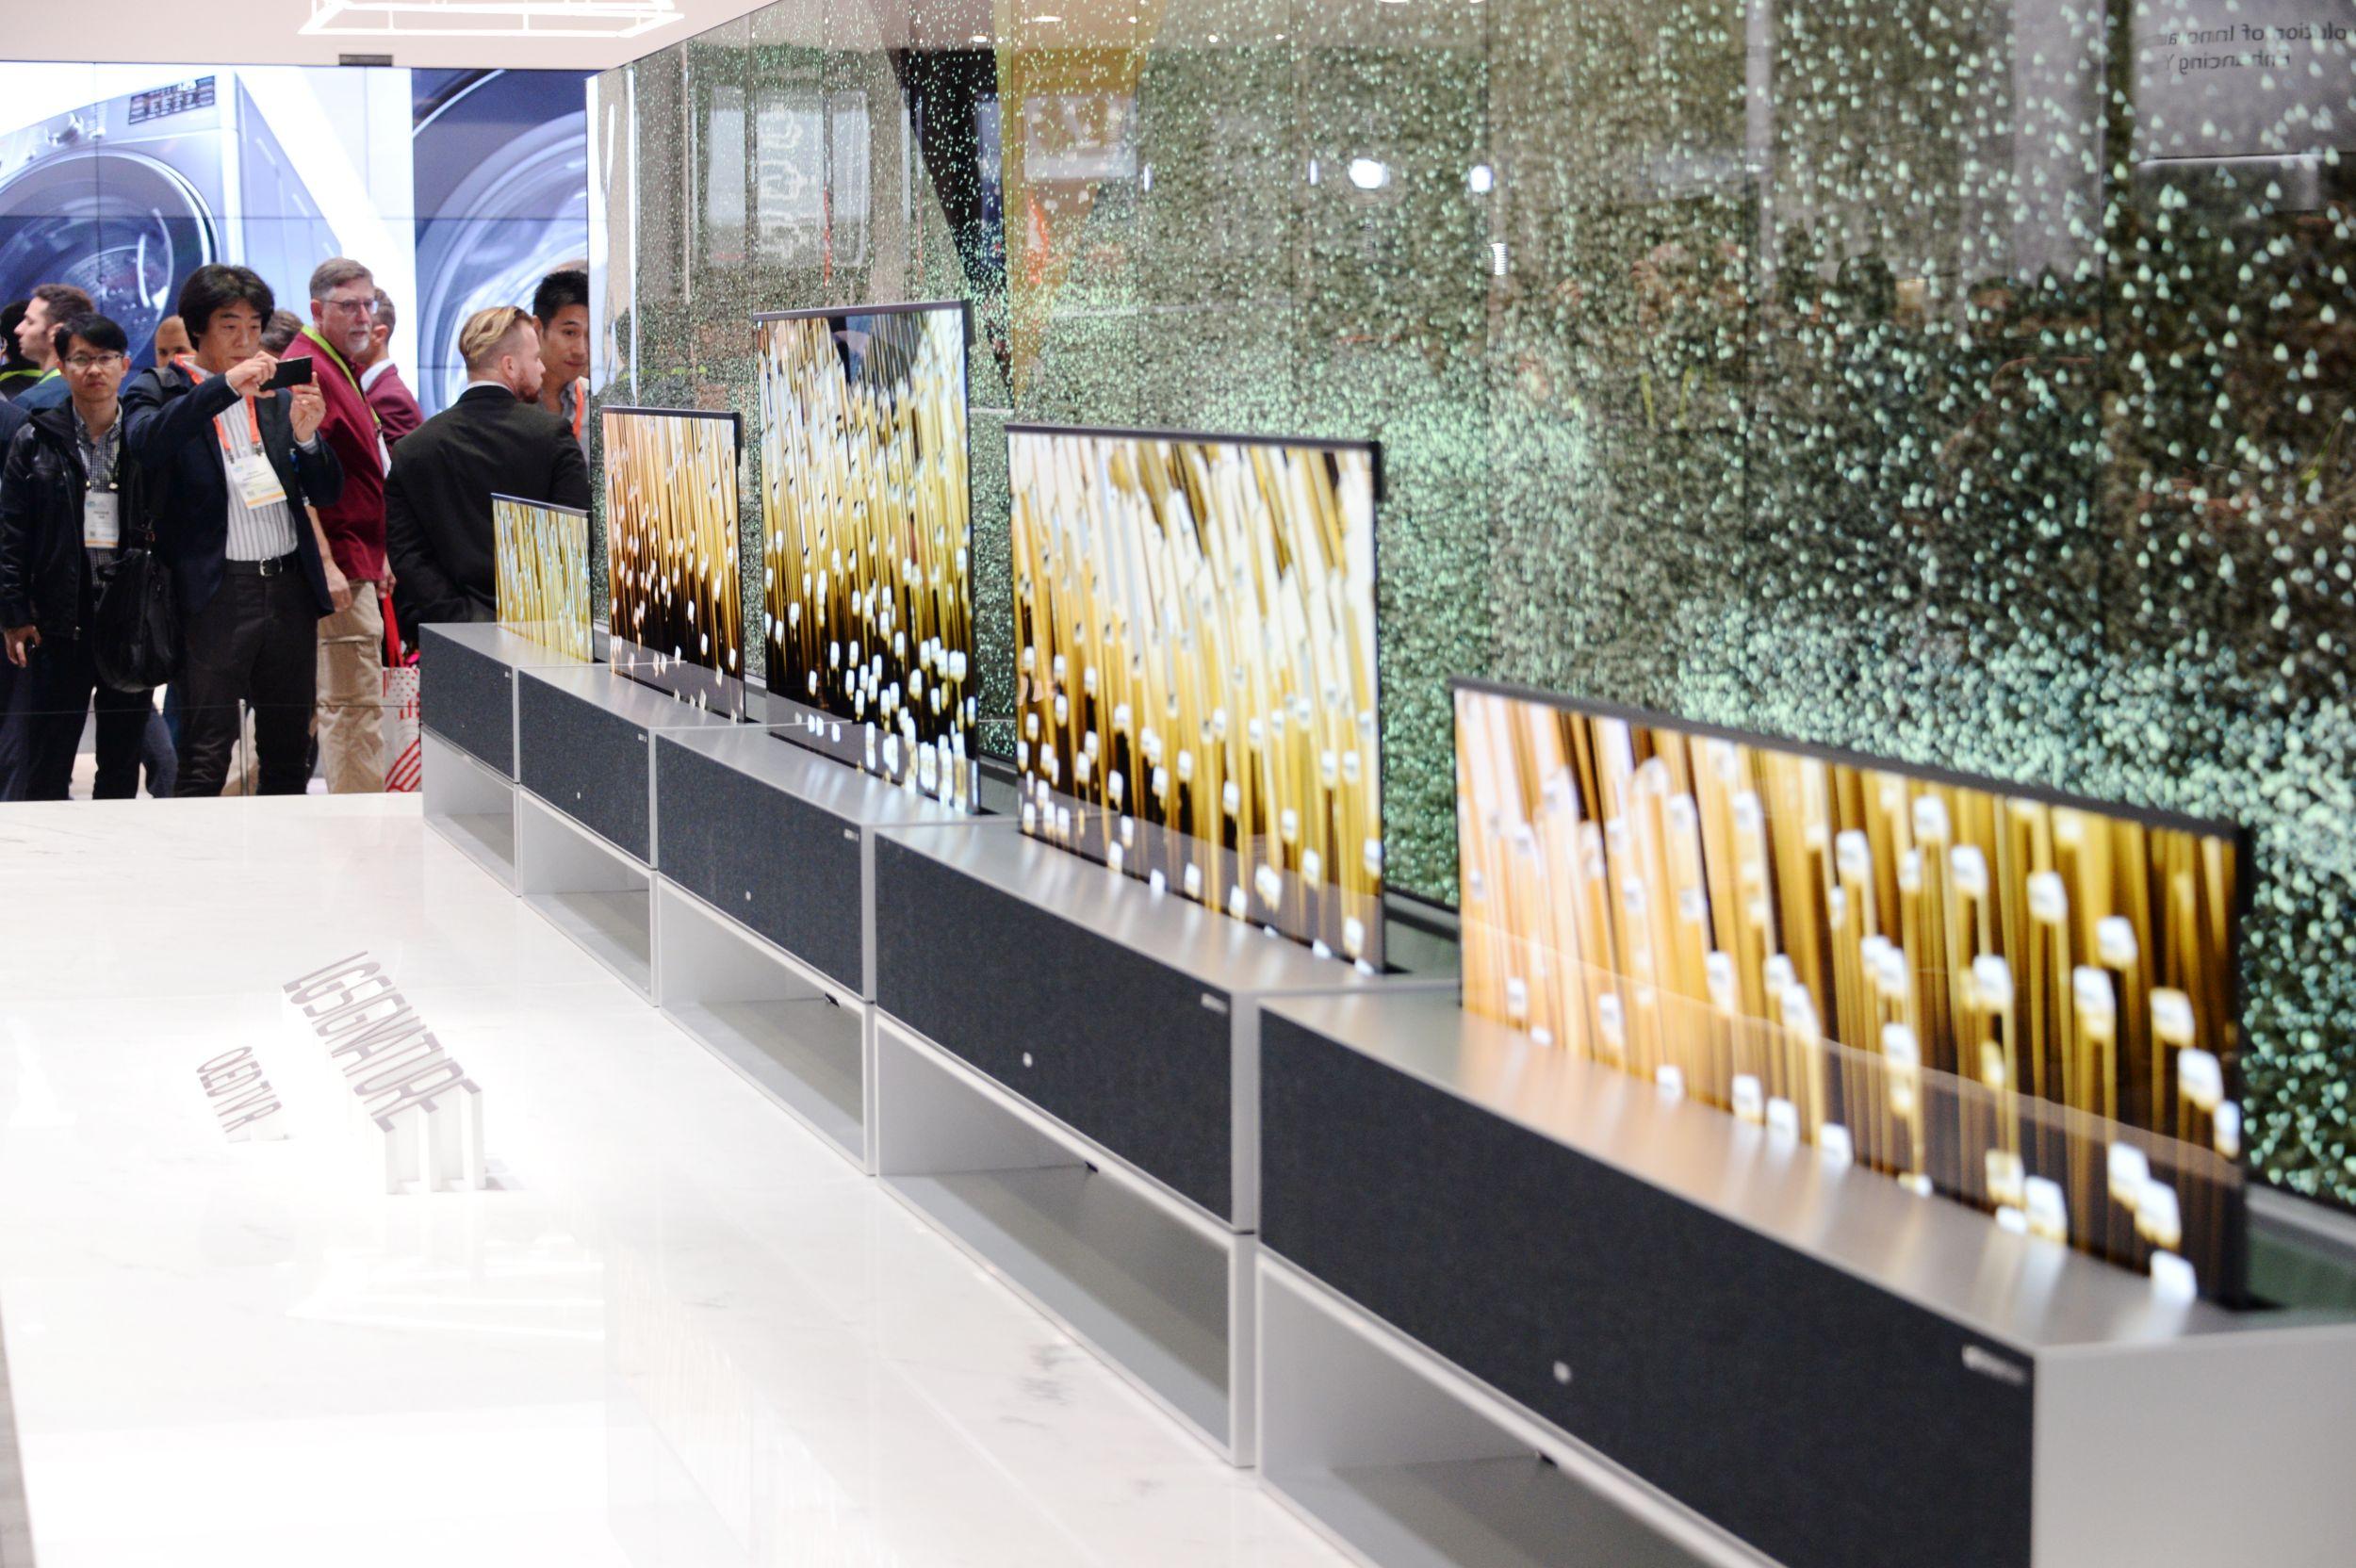 LG 롤러블 올레드 TV, CES 2019 '최고 TV' 선정